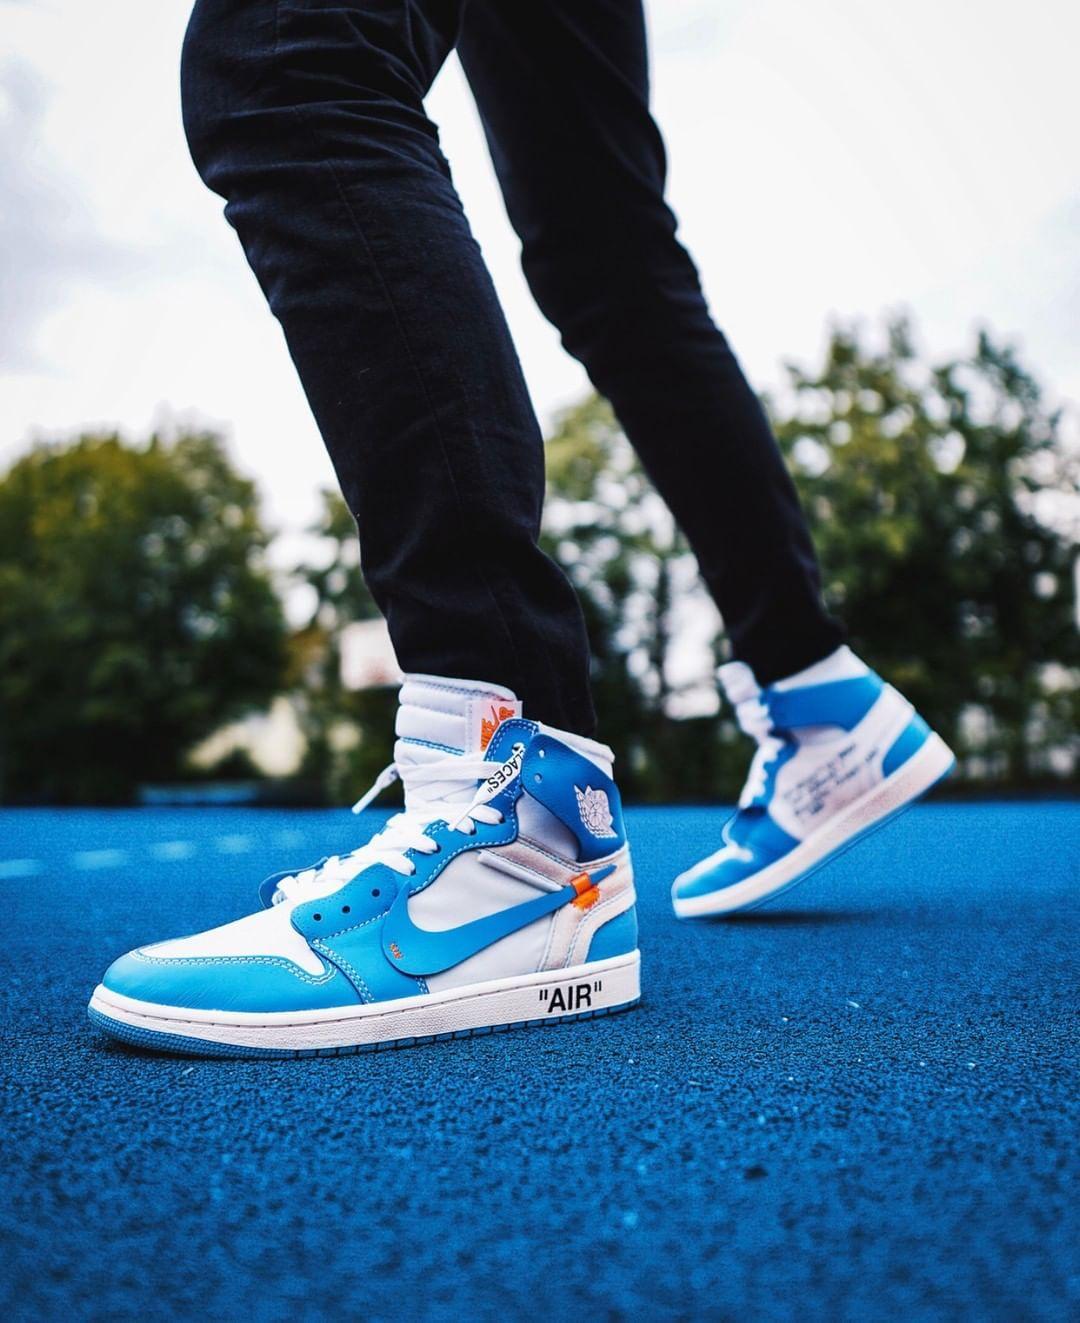 Compra Ya Las Air Jordan 1 High Og X Off White University Blue Por